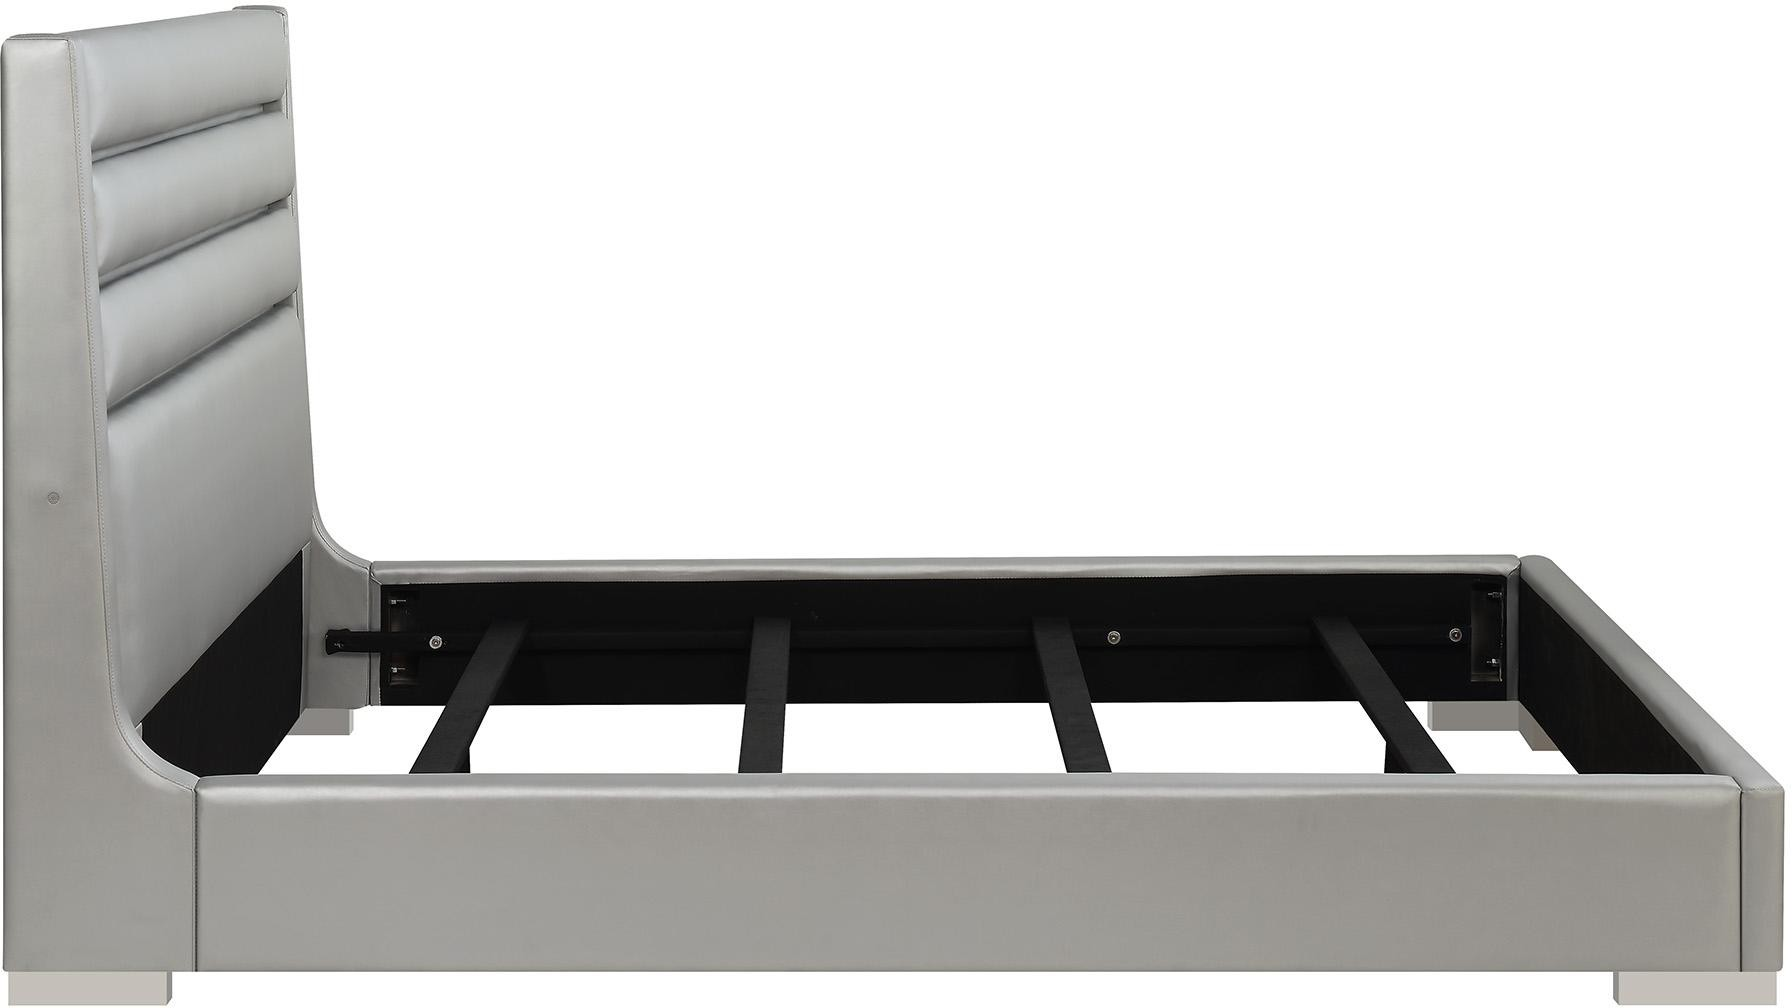 Modern King Bed in Metallic Grey w/ Headboard LED Lights